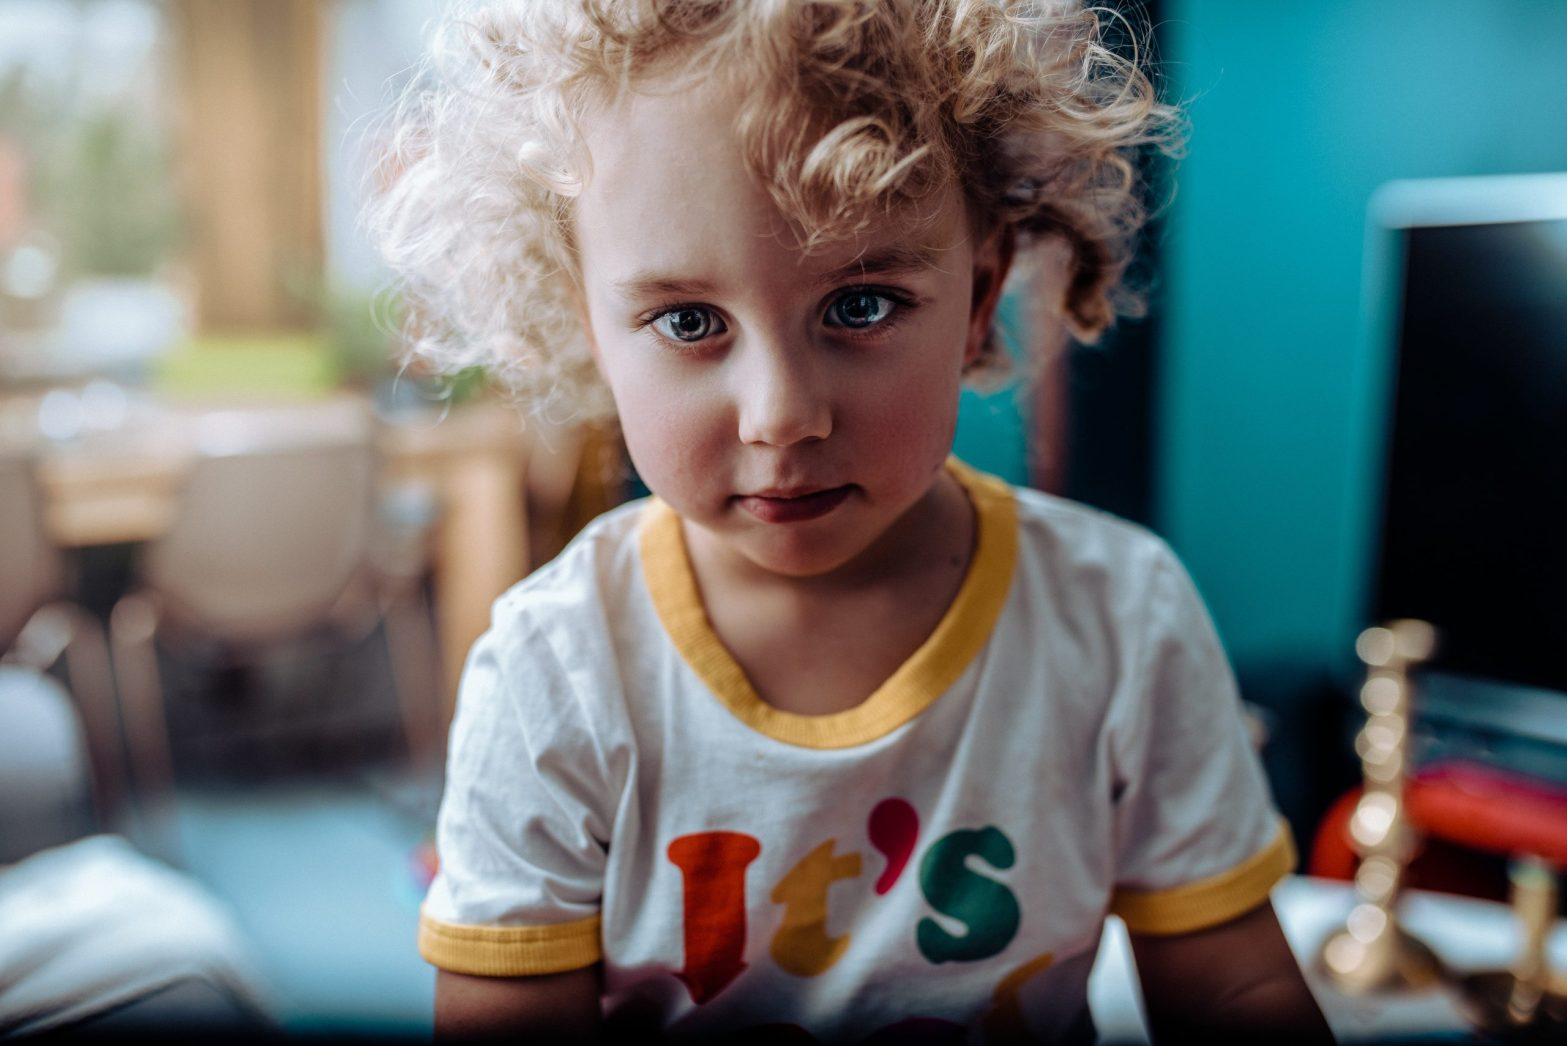 Portrait of an adorable toddler - unmet childhood needs